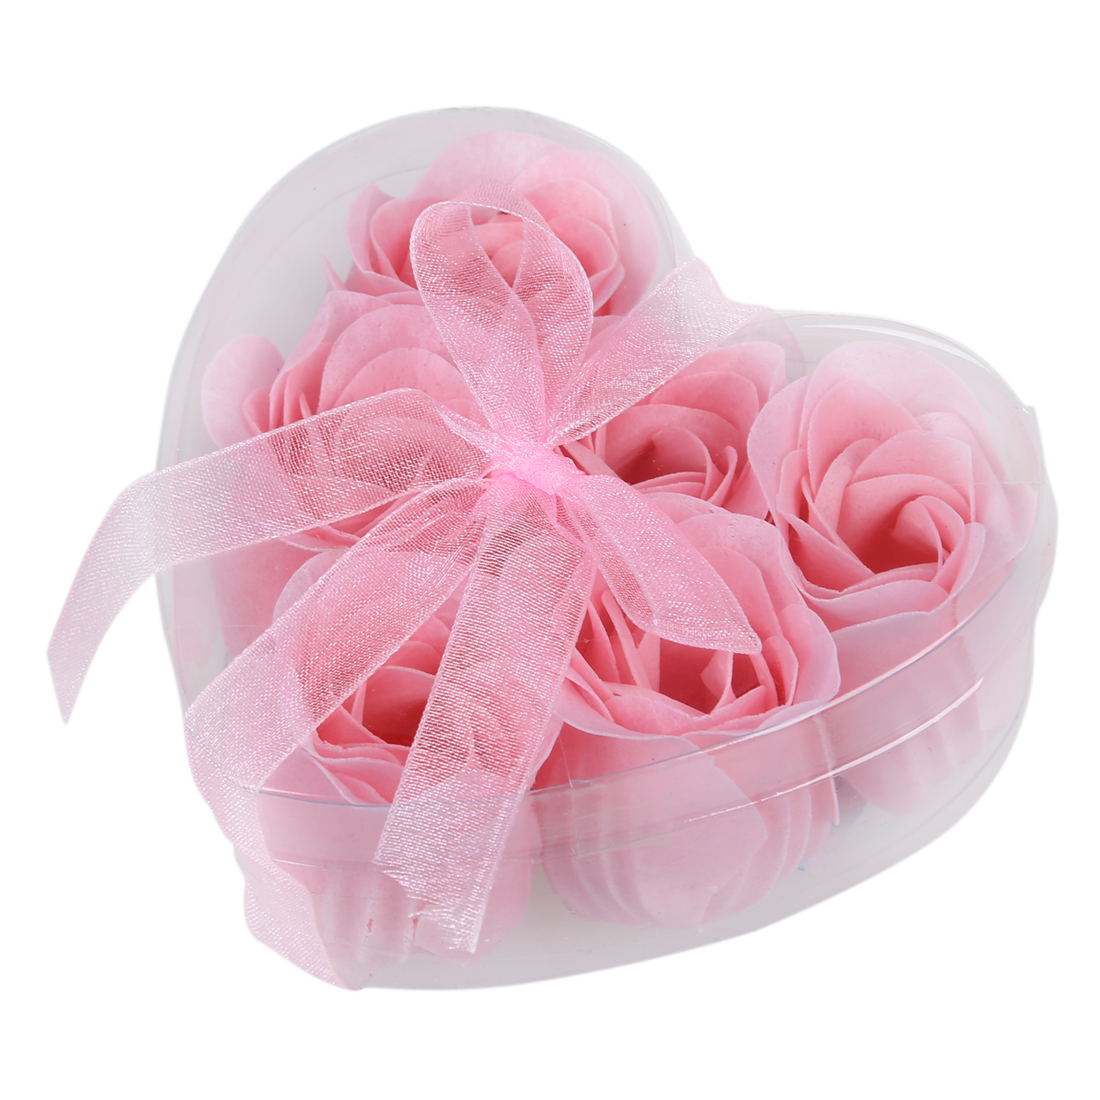 New 6 Pcs Light Pink Decorative Fragrant Rose Bud Petal Soap Wedding Favor